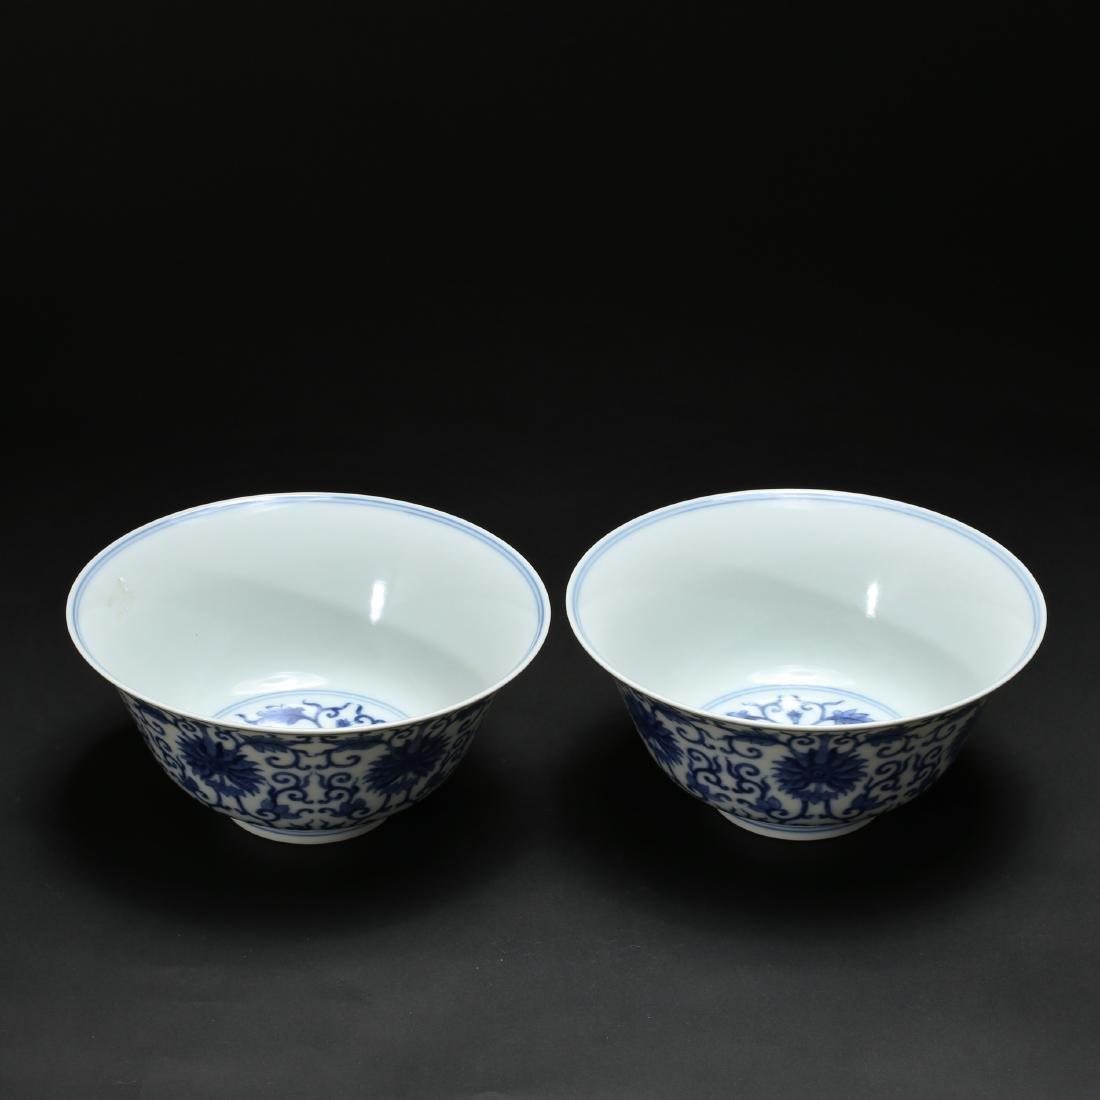 CHINESE BLUE AND WHITE FOLIAGE BOWLS - 3